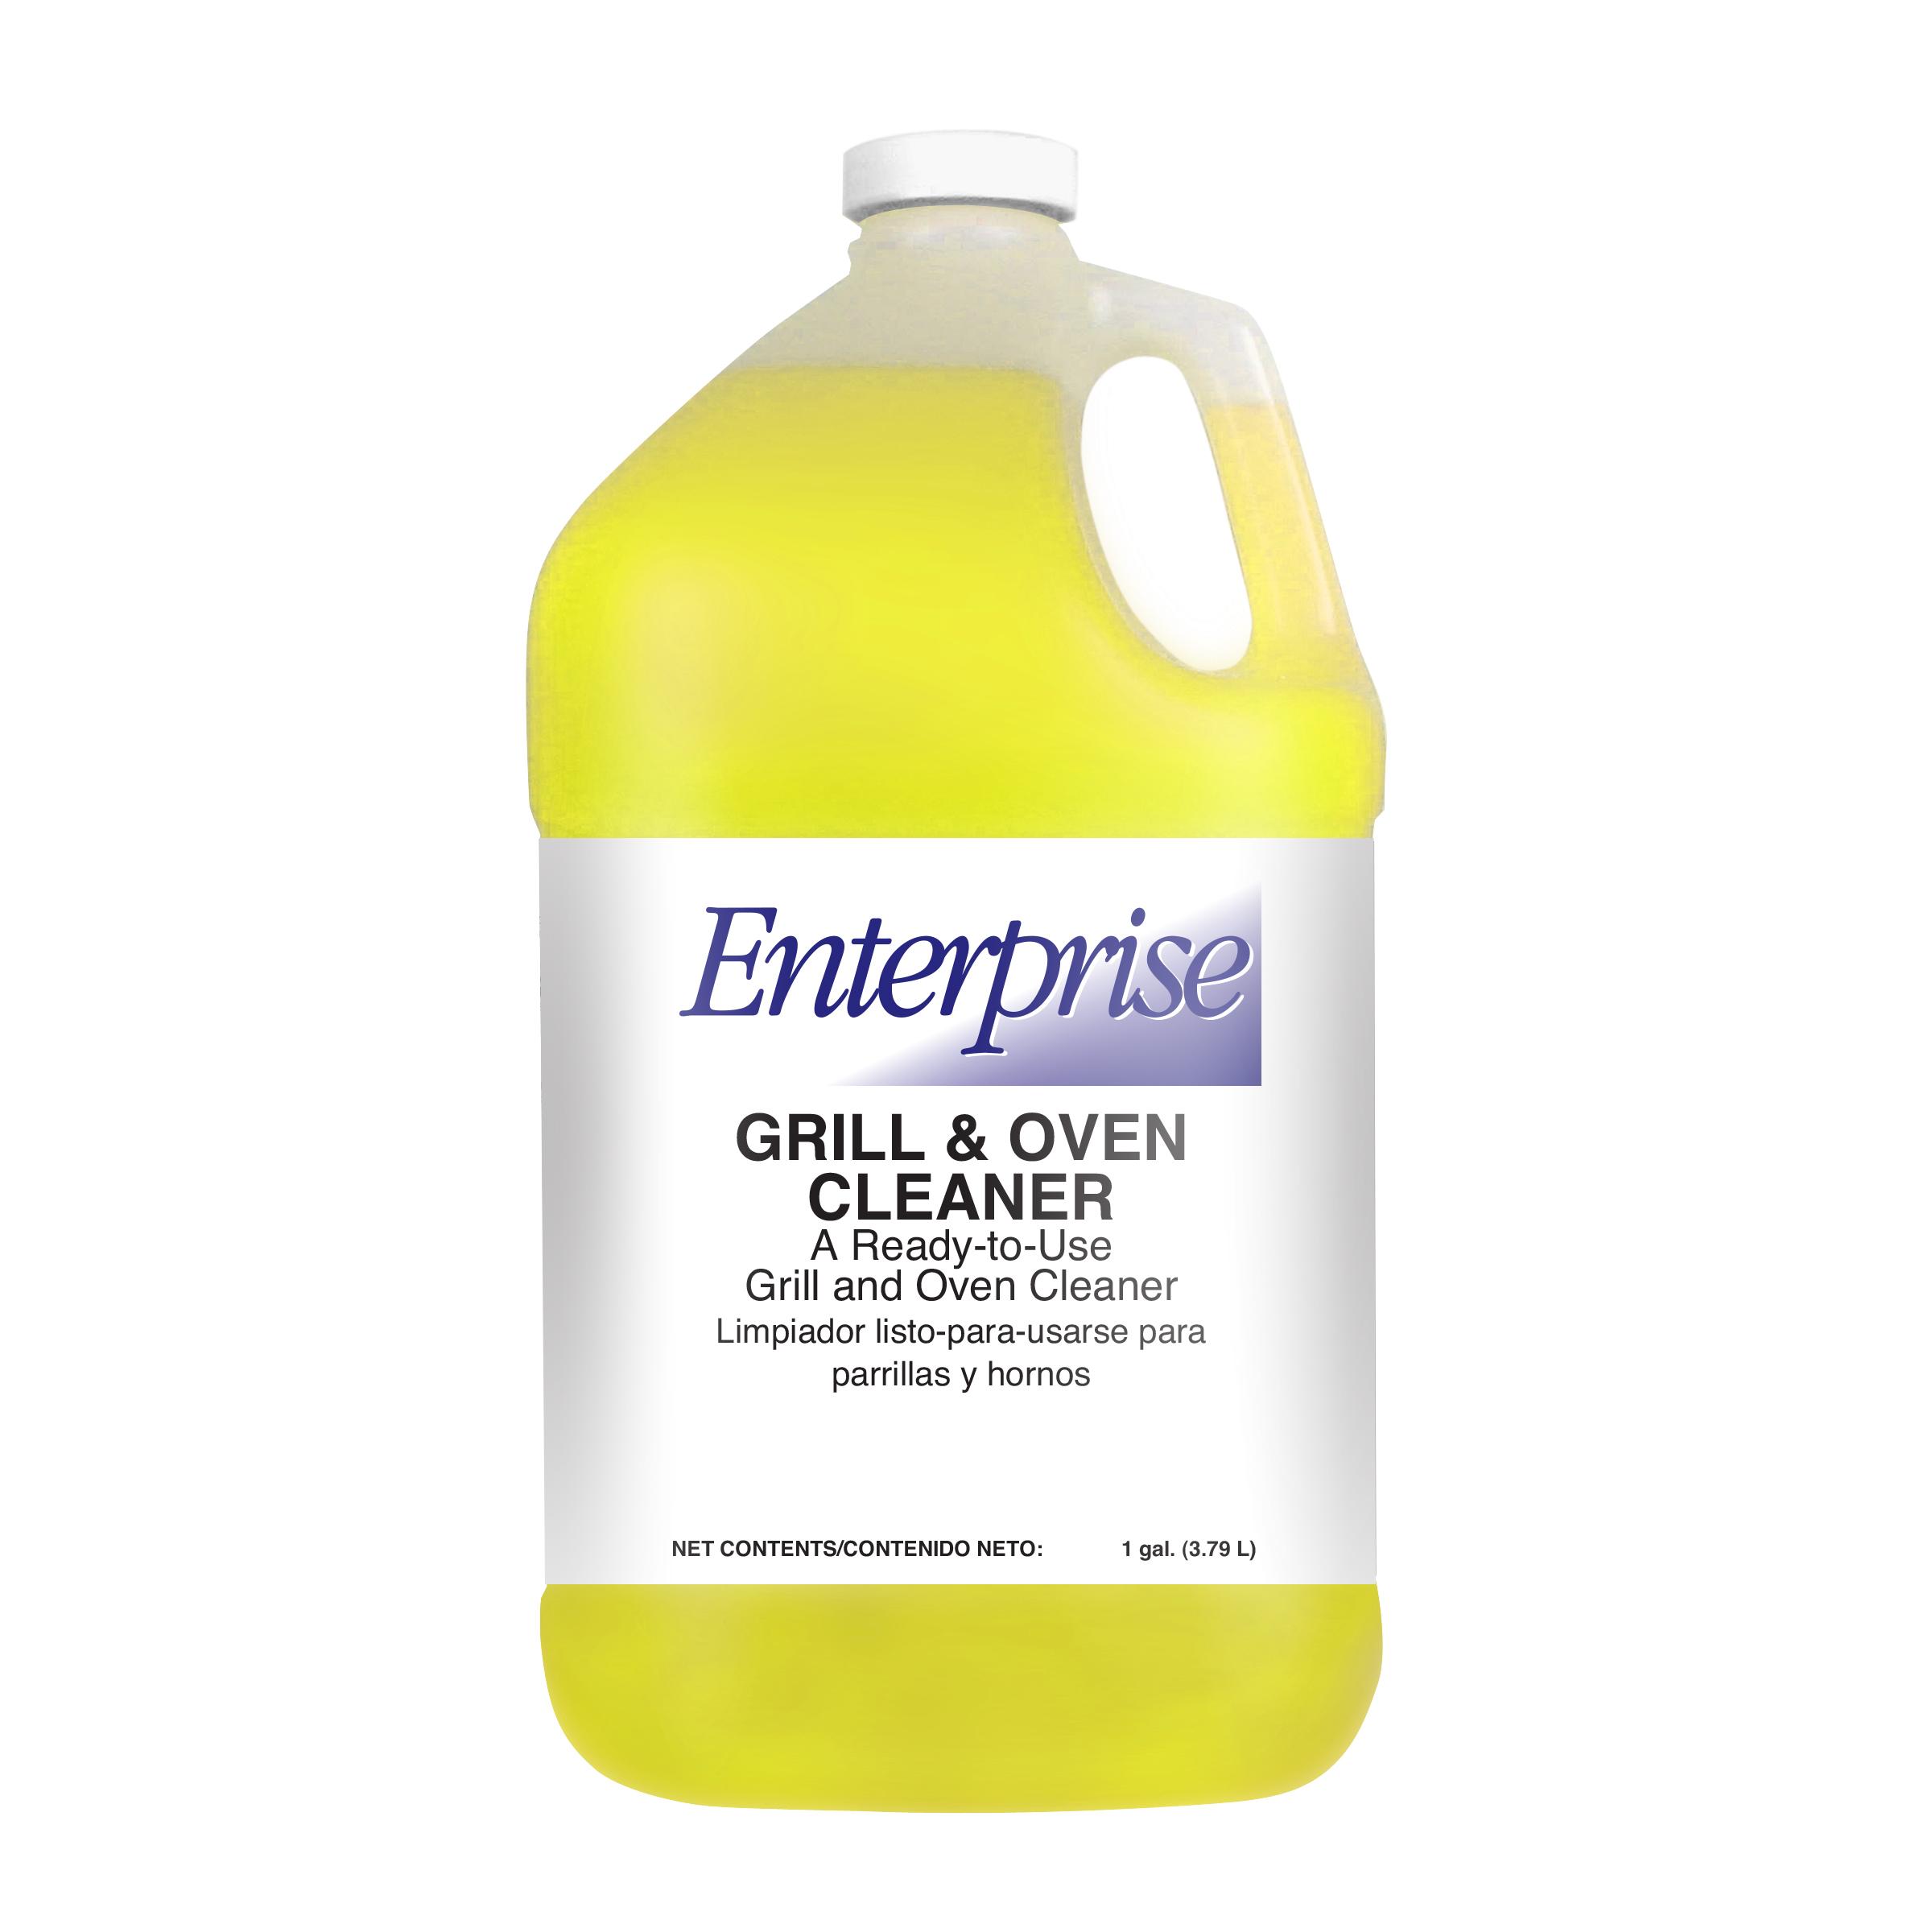 63948_Enterprise_Grill_Oven_Cleaner_1GA